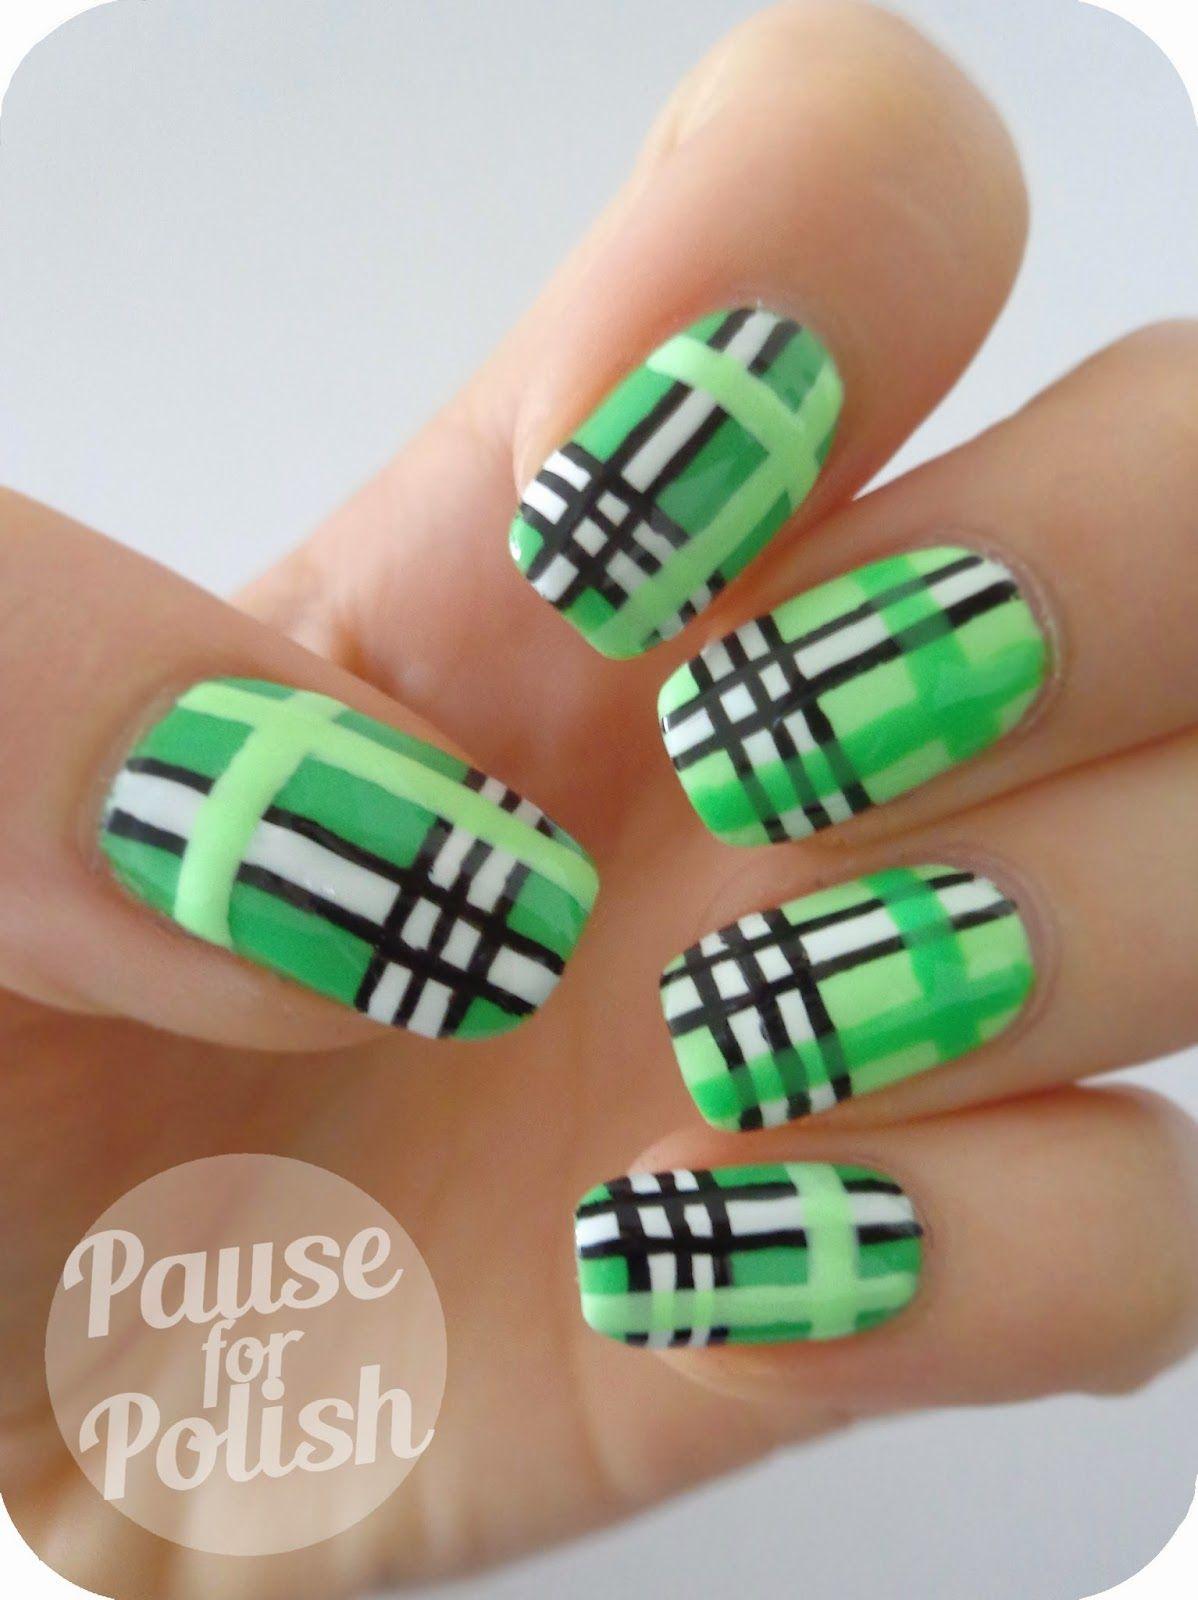 Pause for polish claireus accessories neon plaid nail art